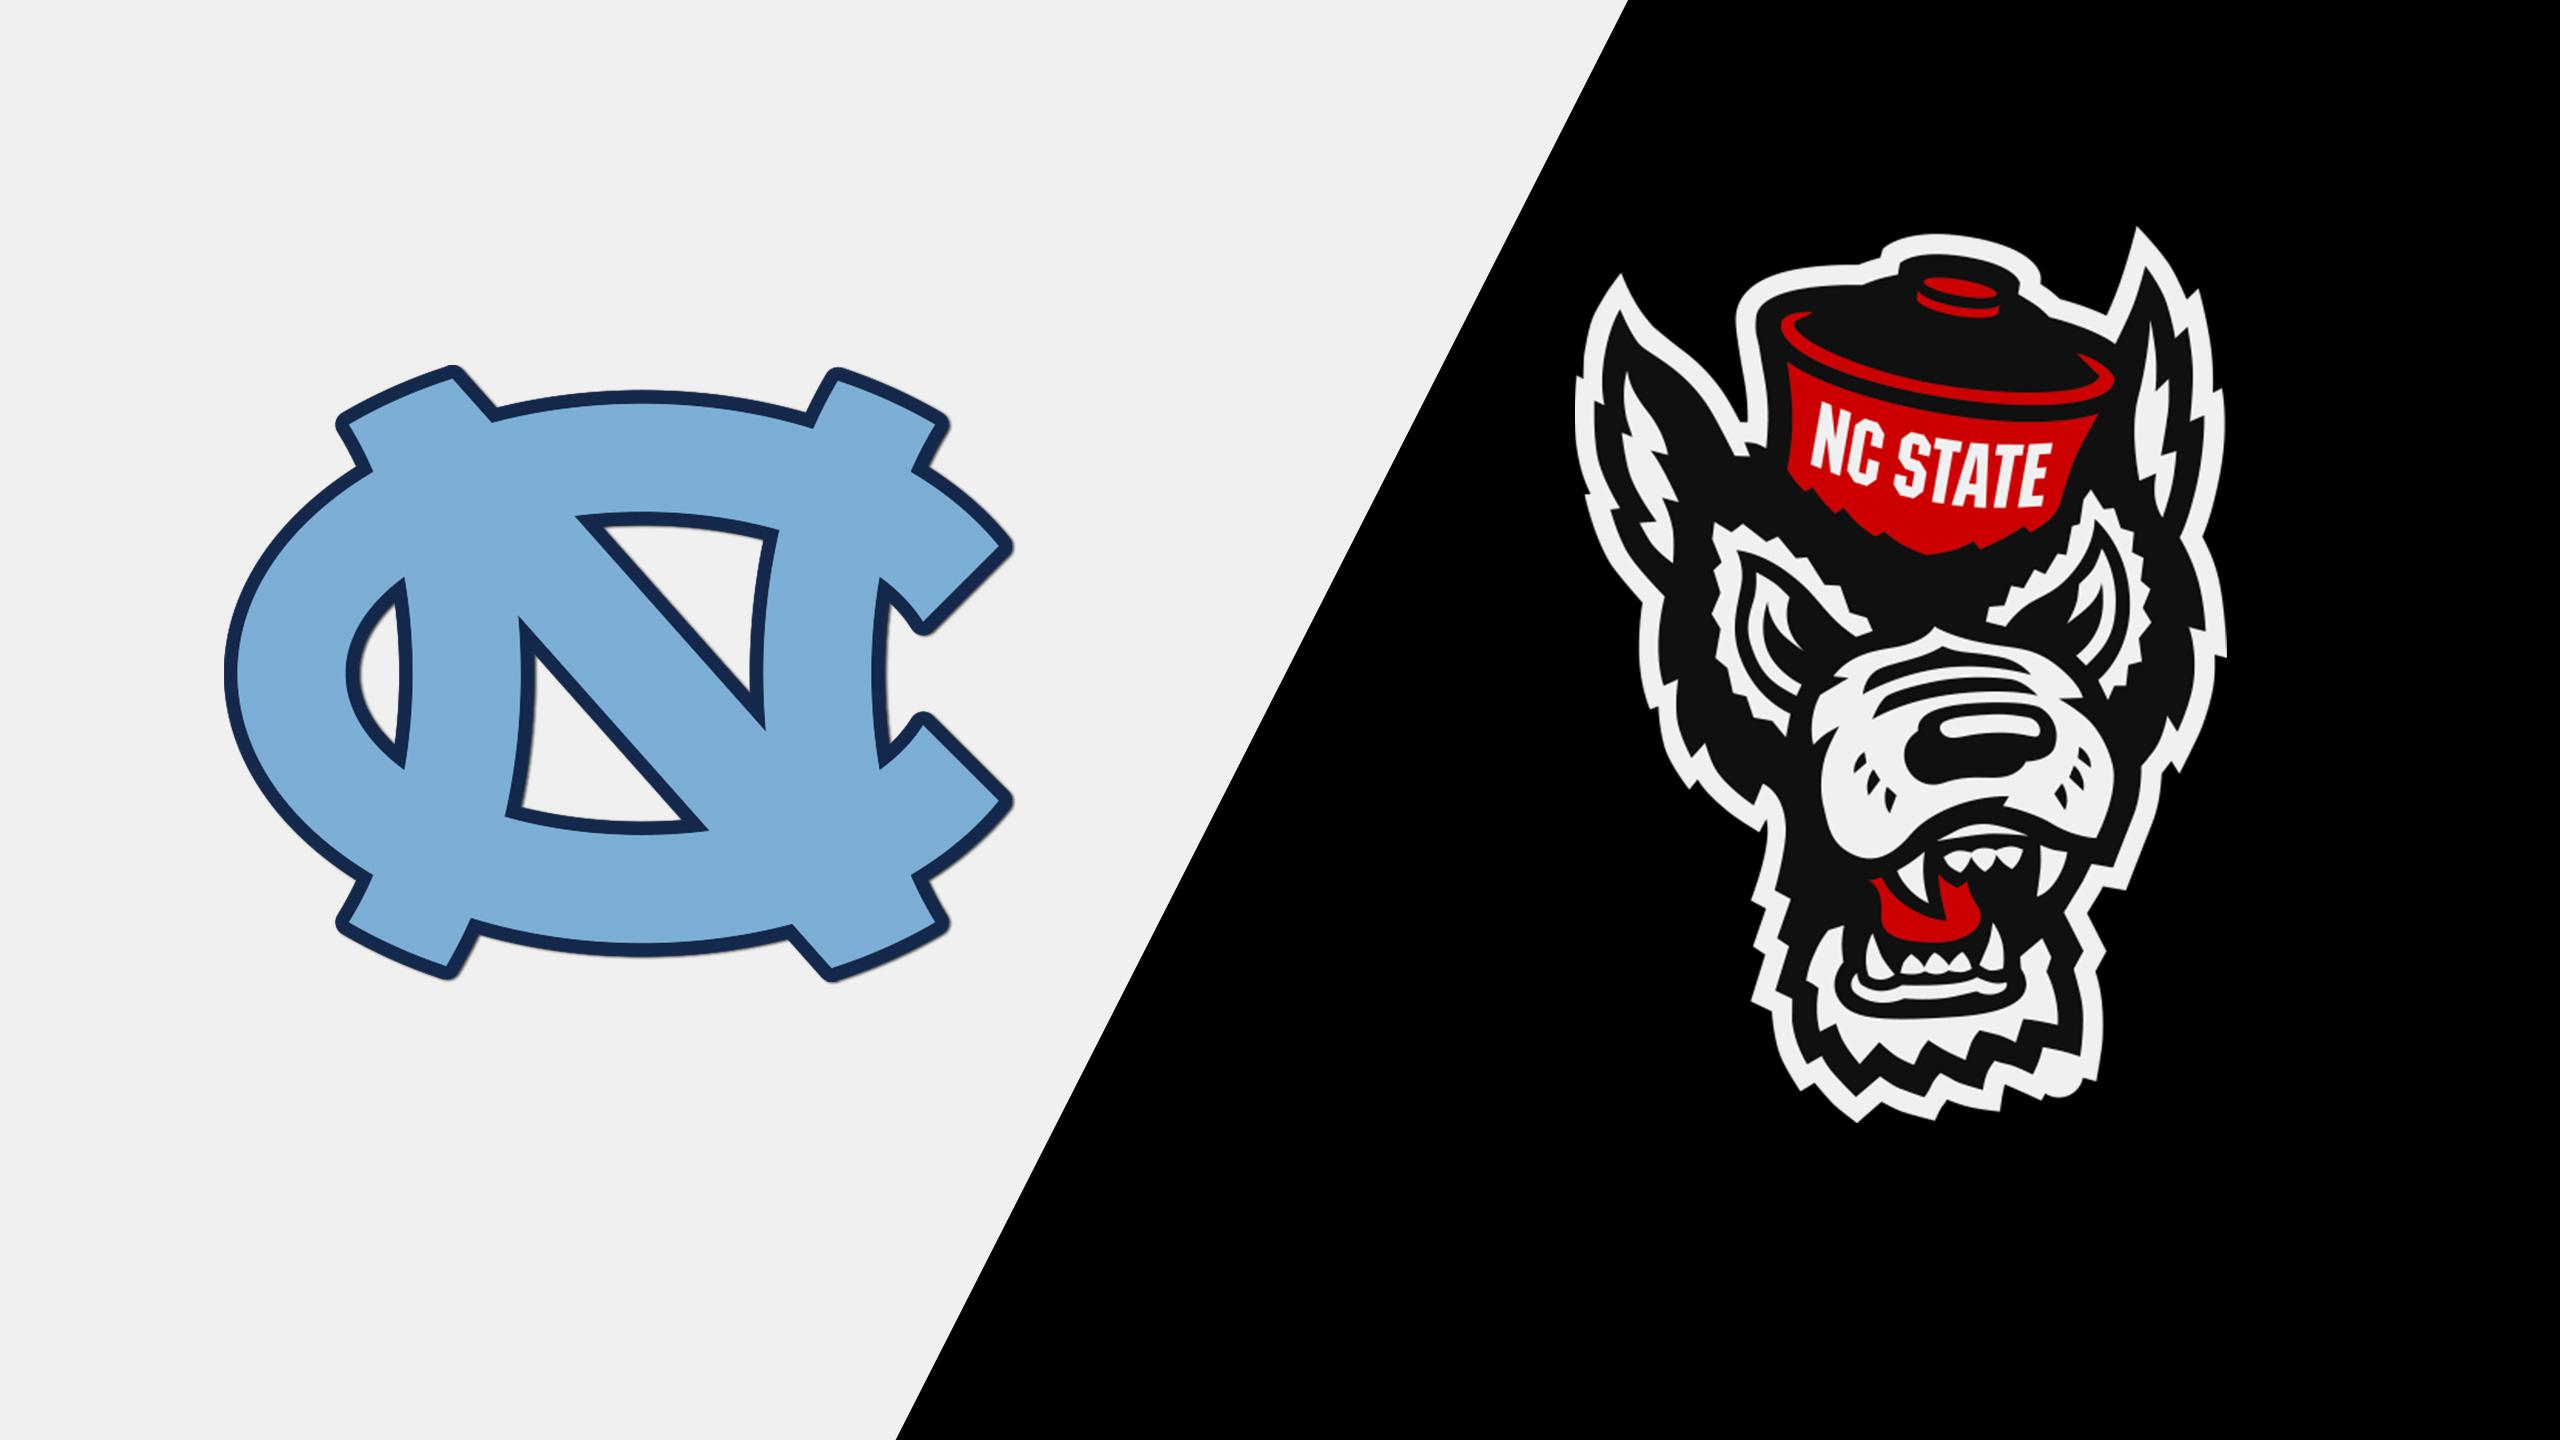 #1 North Carolina vs. NC State (M Soccer)